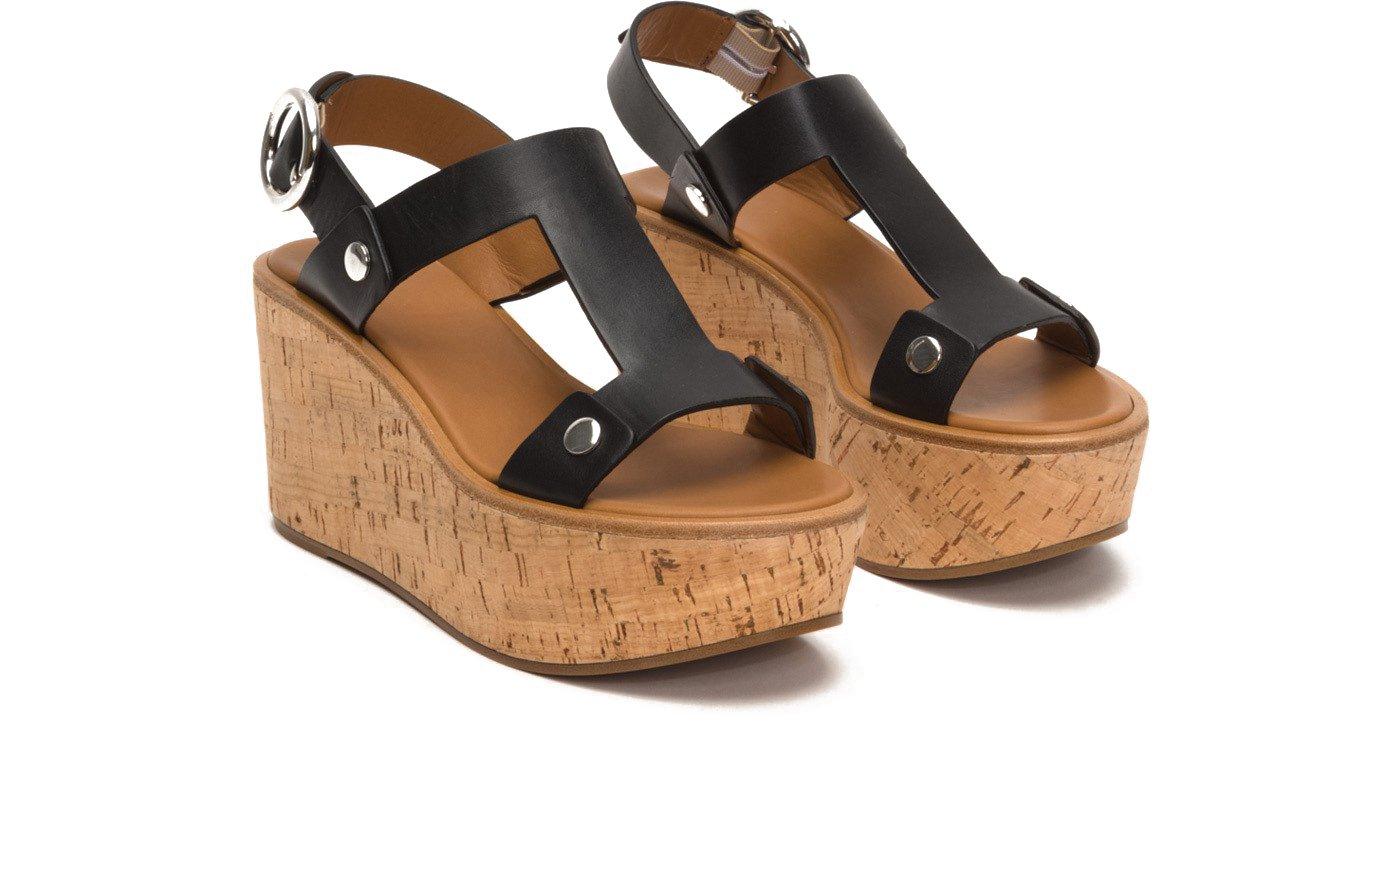 FRYE 79956 Women's Dahlia Rivet Wedge Sandal B076KTLNZV 8 B(M) US|Black